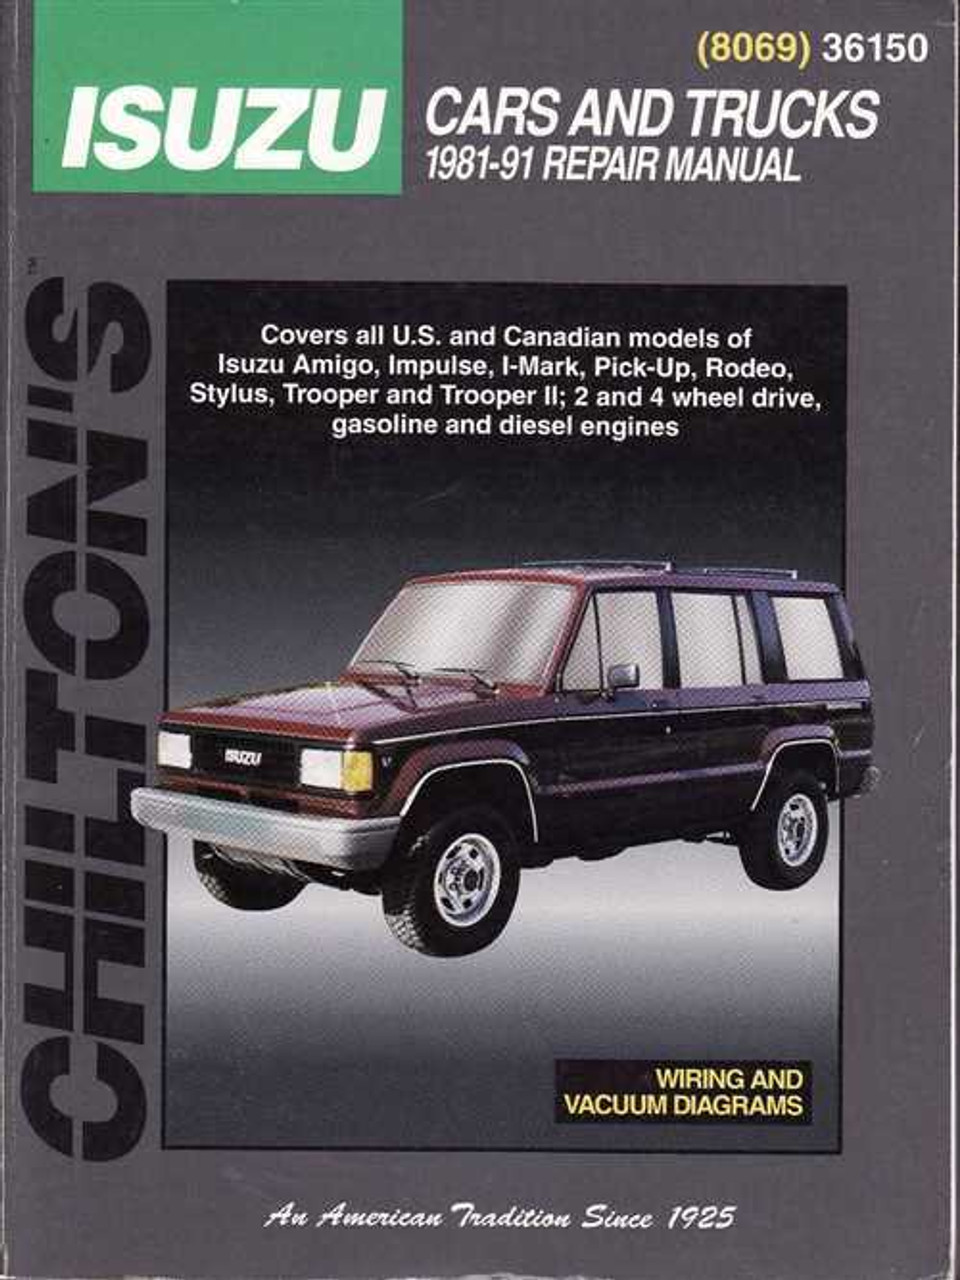 Holden (Isuzu) Cars and Trucks 1981 - 1991 Workshop Manual